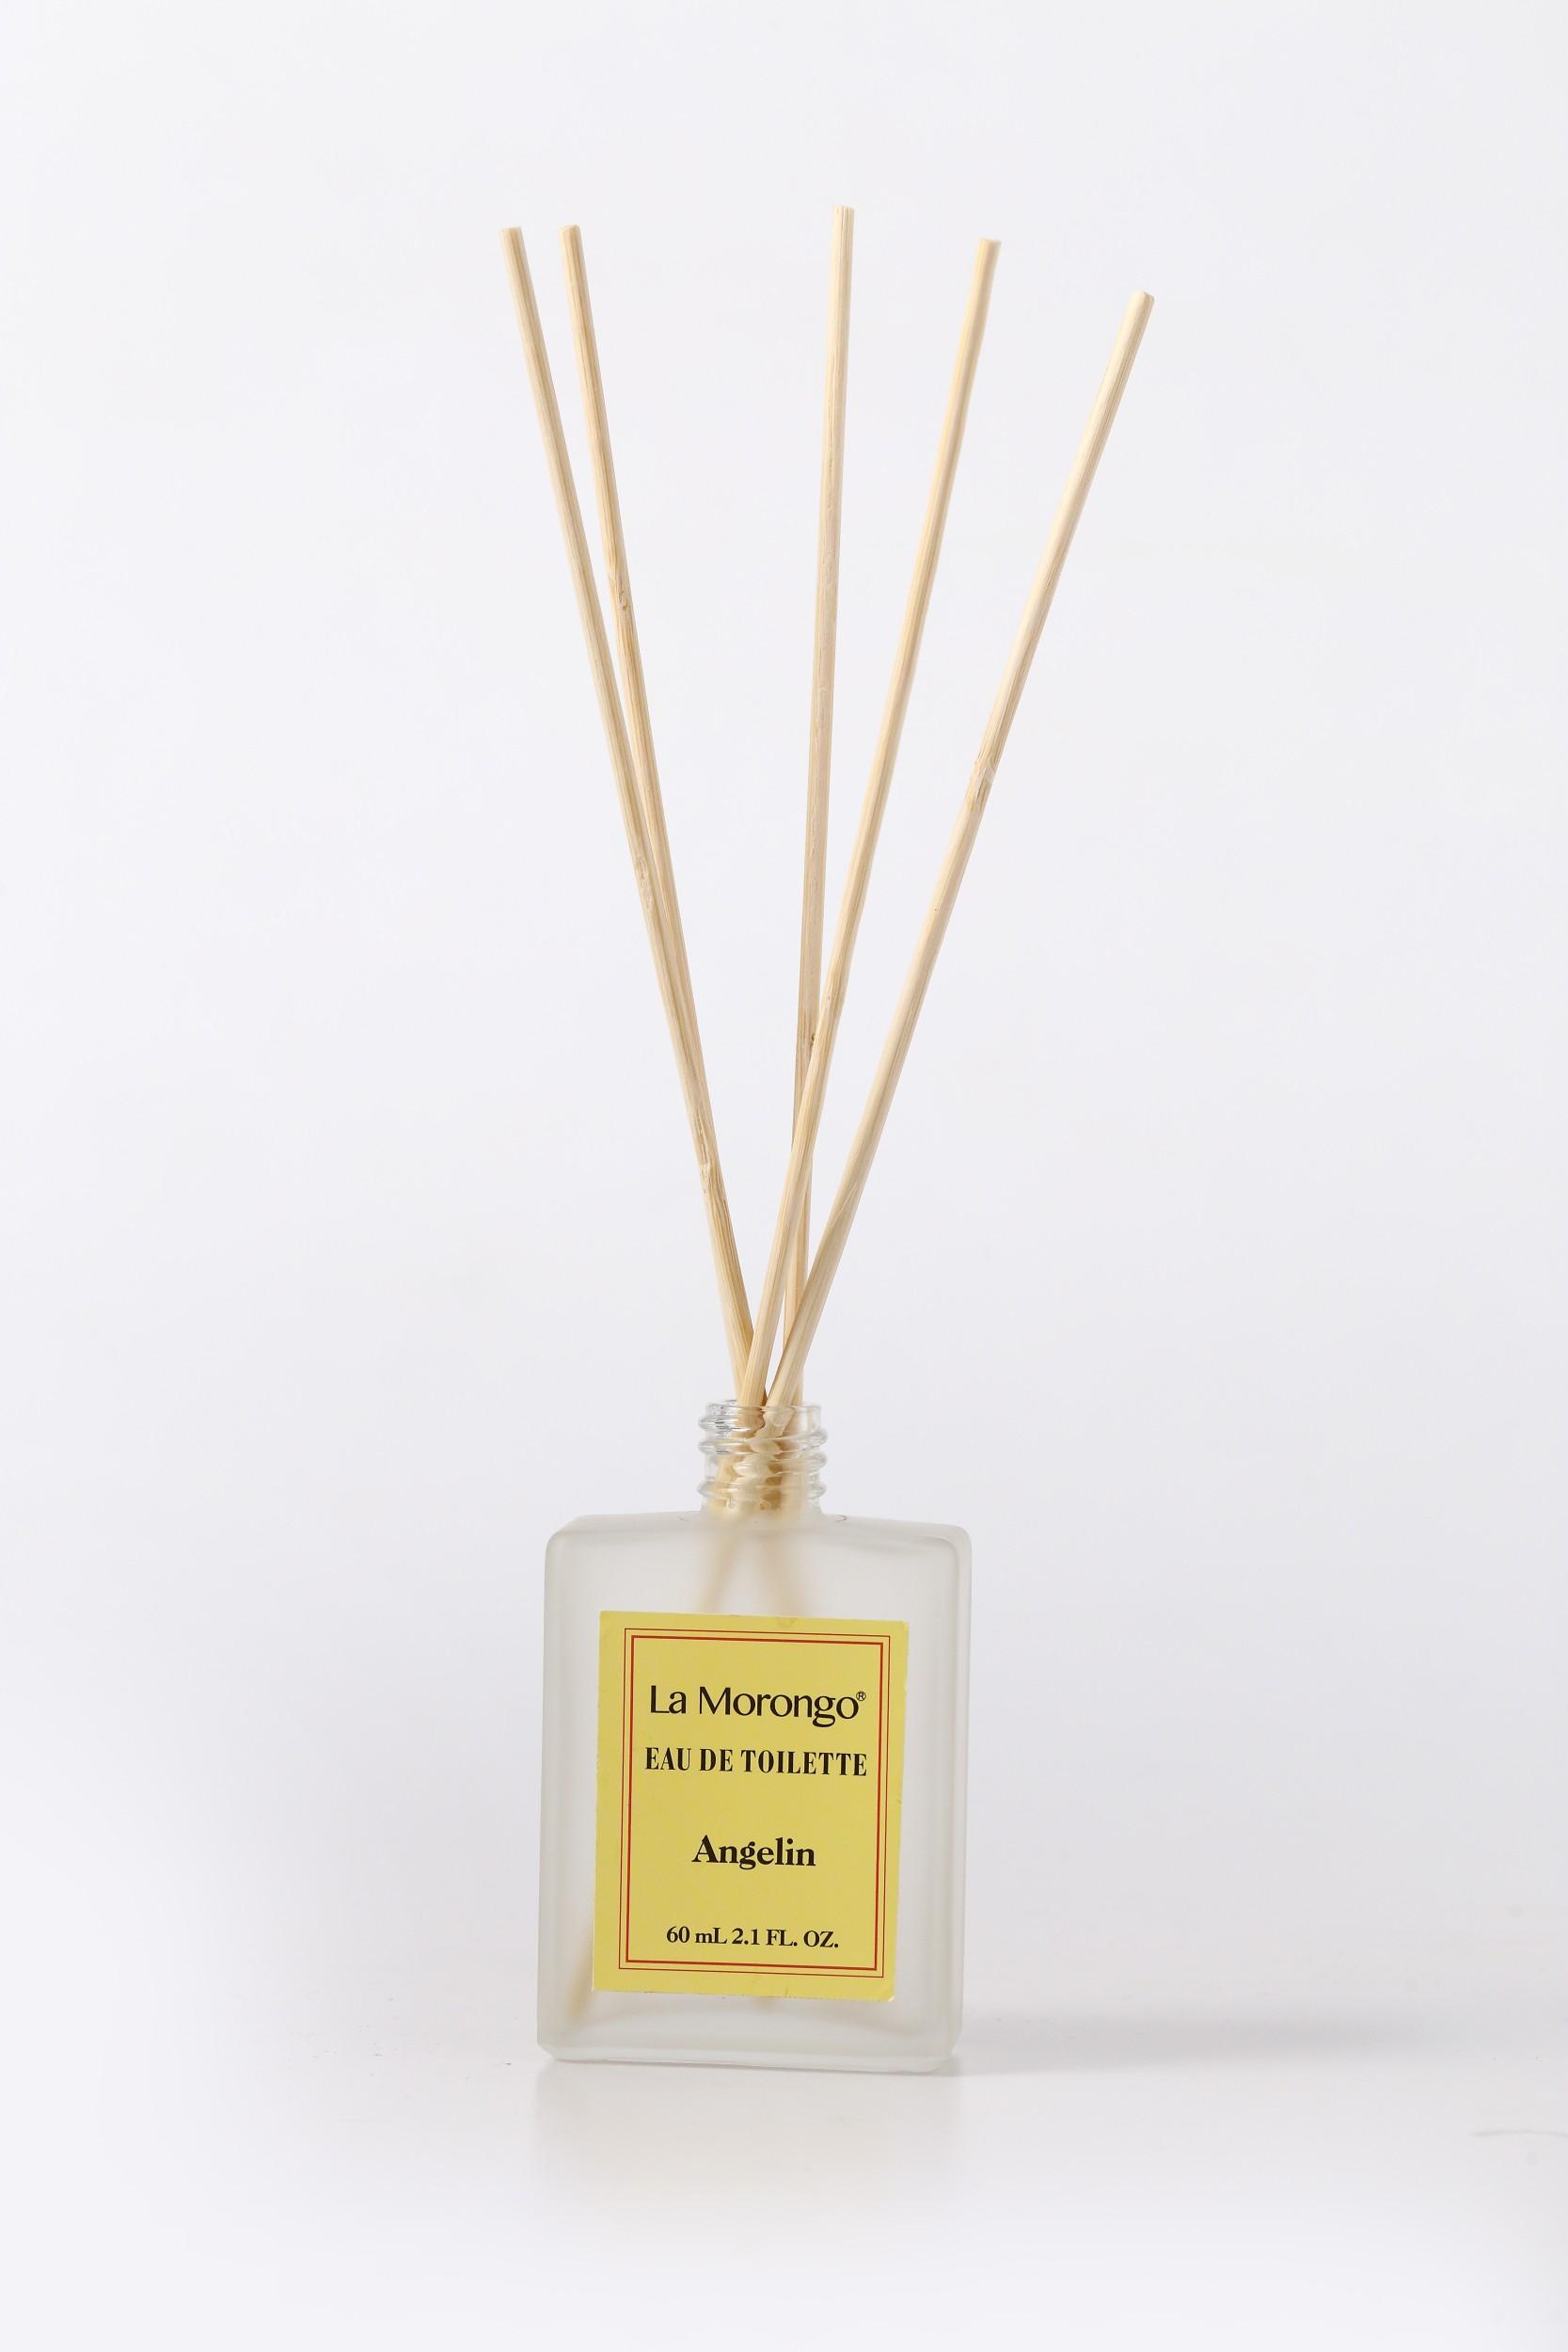 Angelin bamboo reed diffuser 黃標安潔琳醇厚木質地檀香茉莉精油香氛噴霧擴香竹 60mL